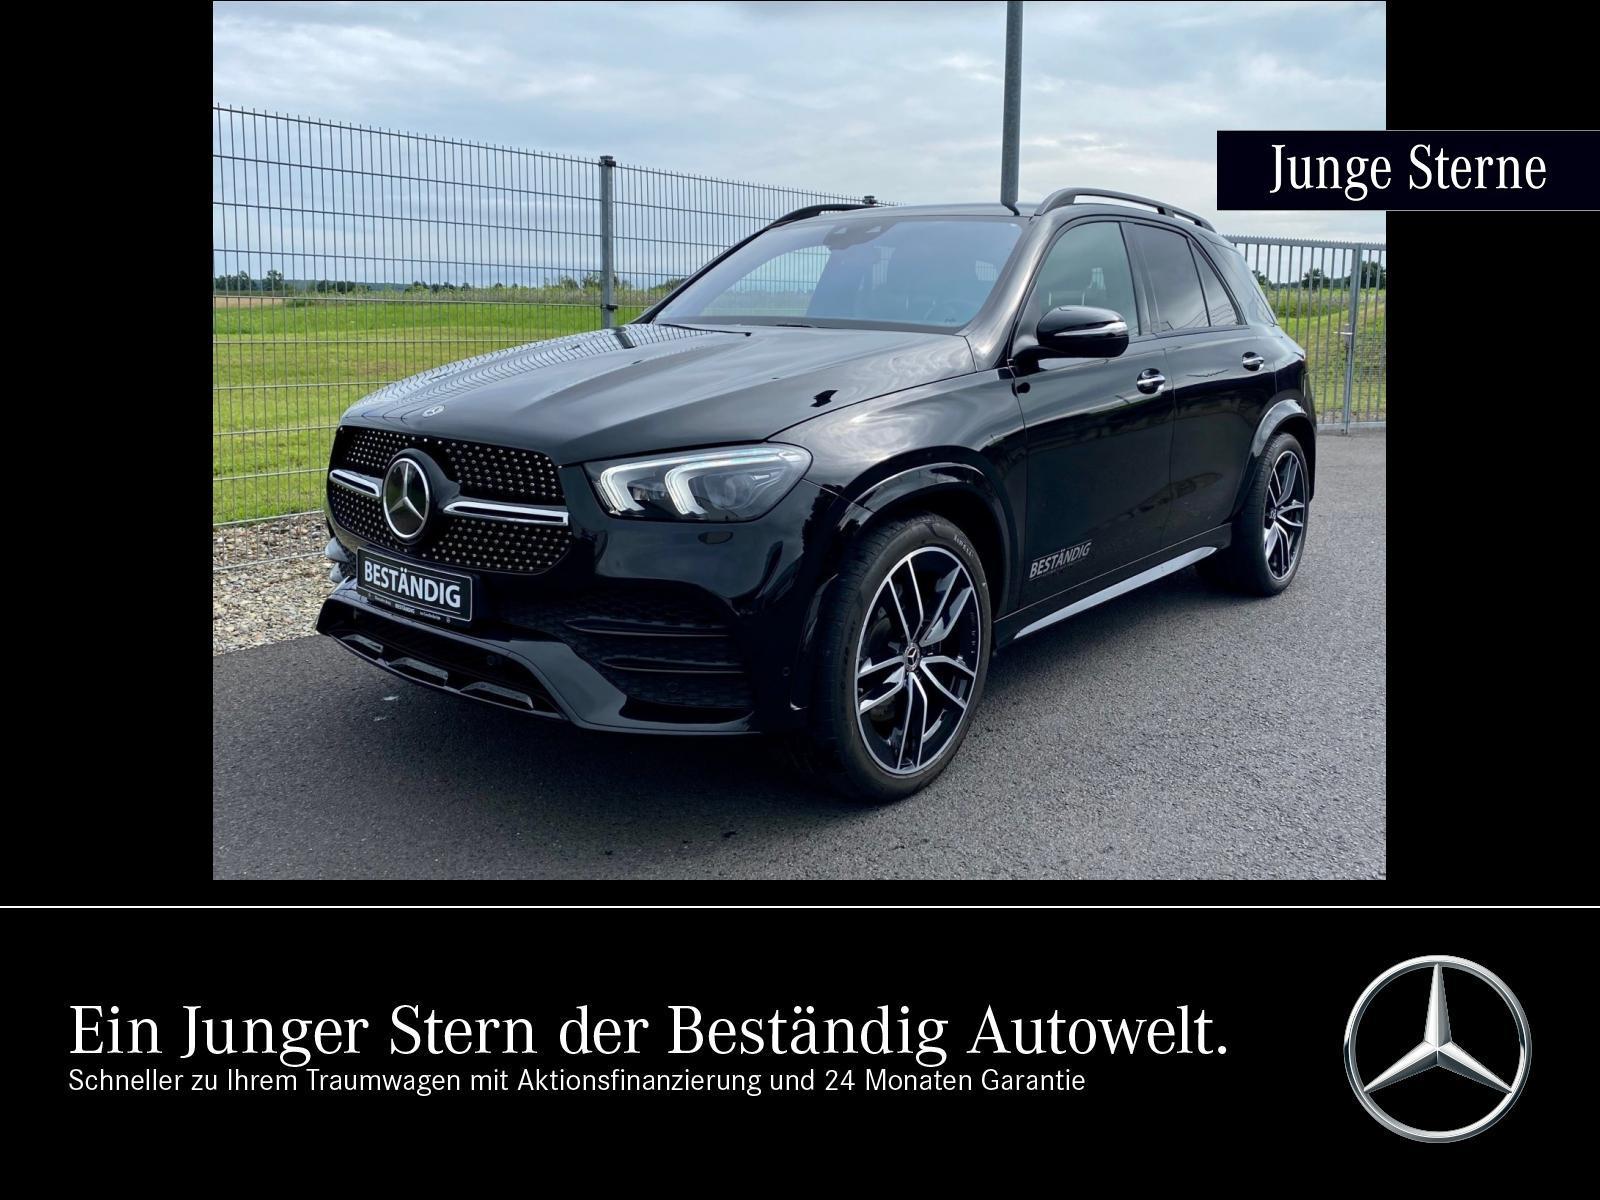 Mercedes-Benz GLE 400 d 4M +AMG+FAHRASS.+PANO+360+AHK+BRABUS+, Jahr 2019, Diesel